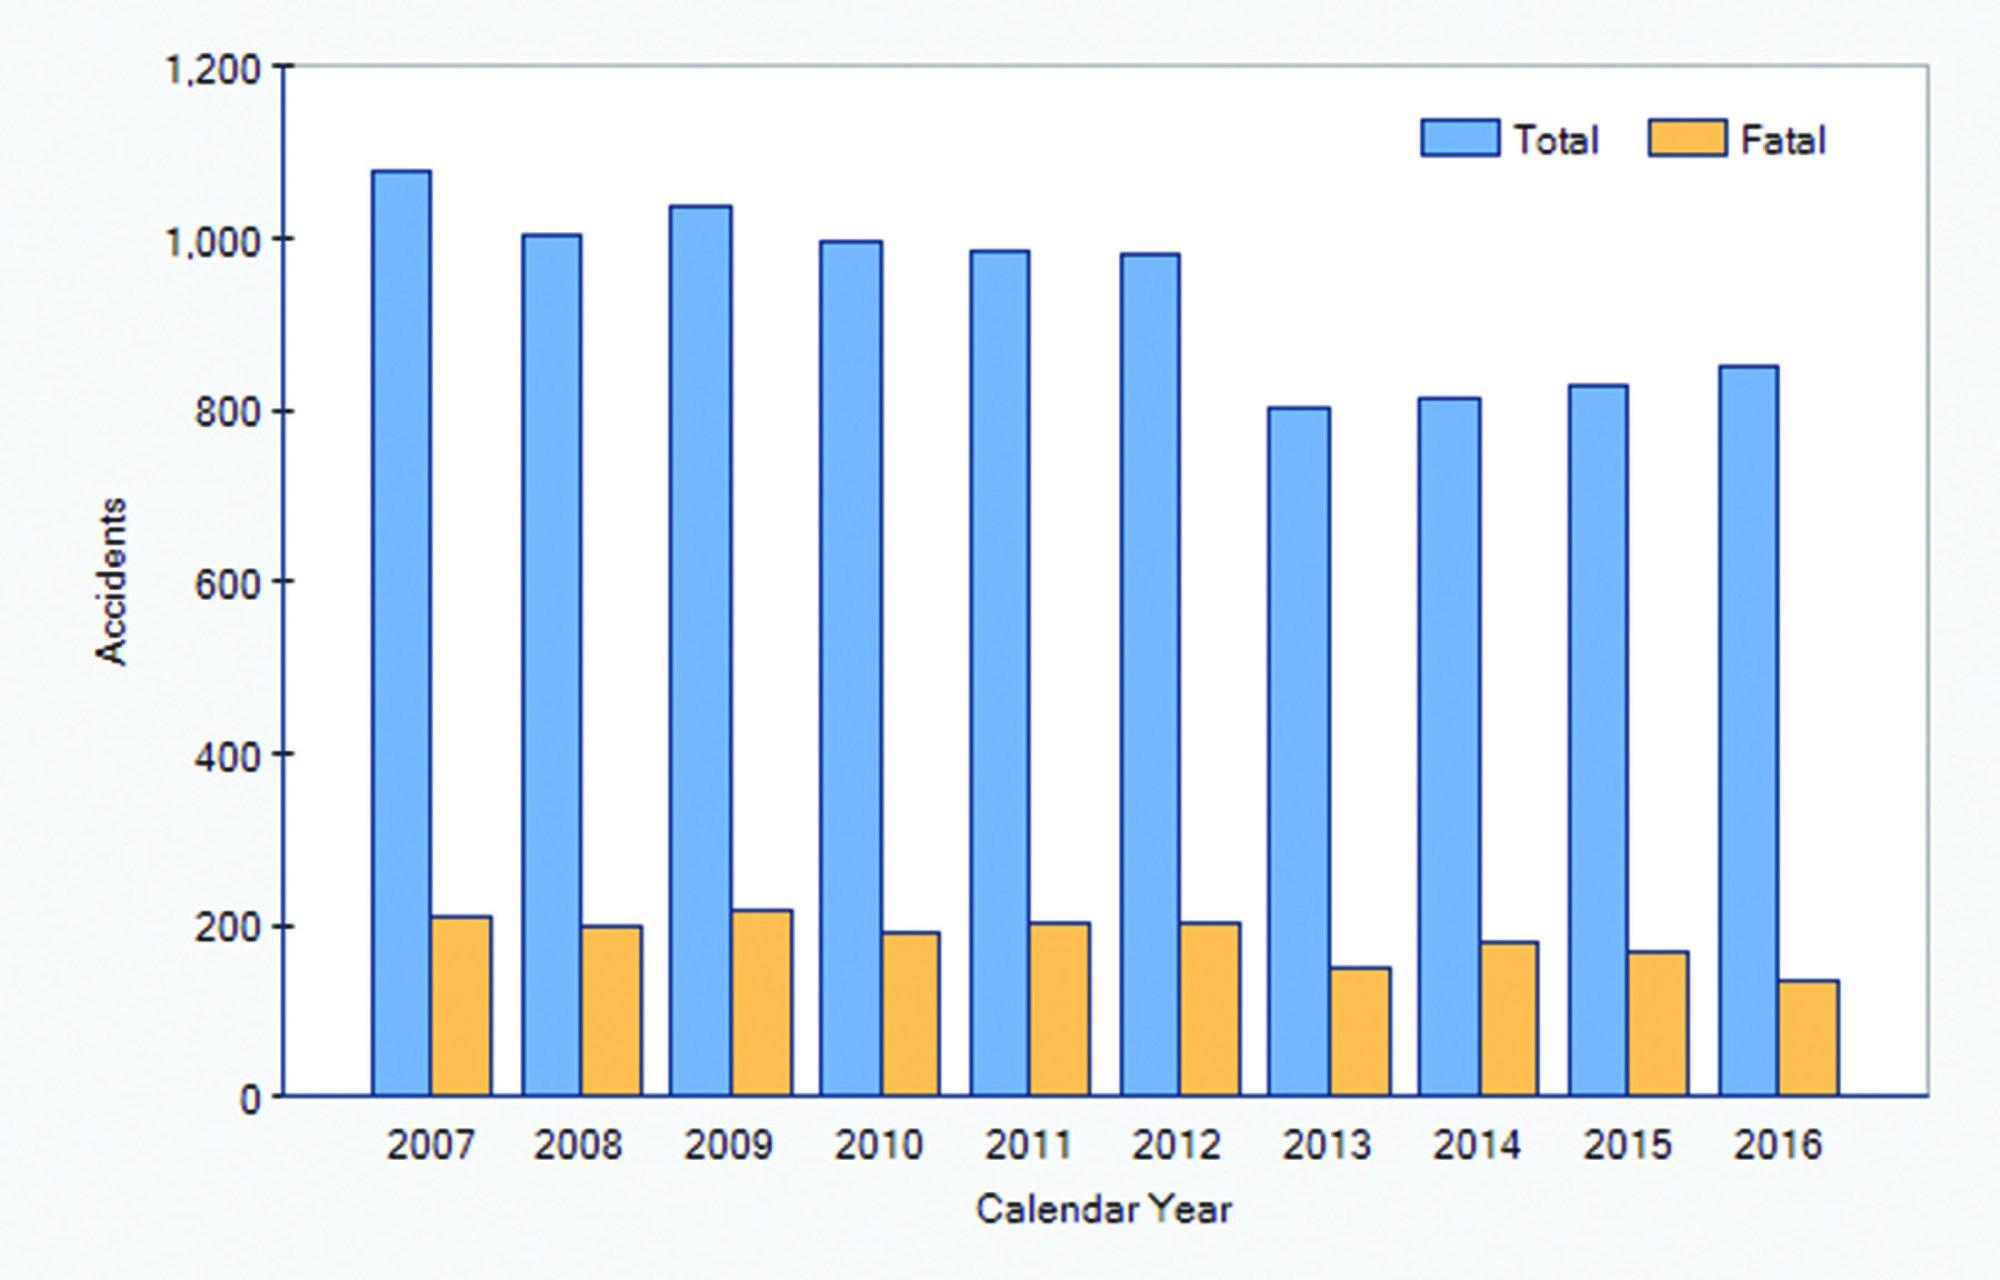 NTSB_PersonalAccidents_2007_2016